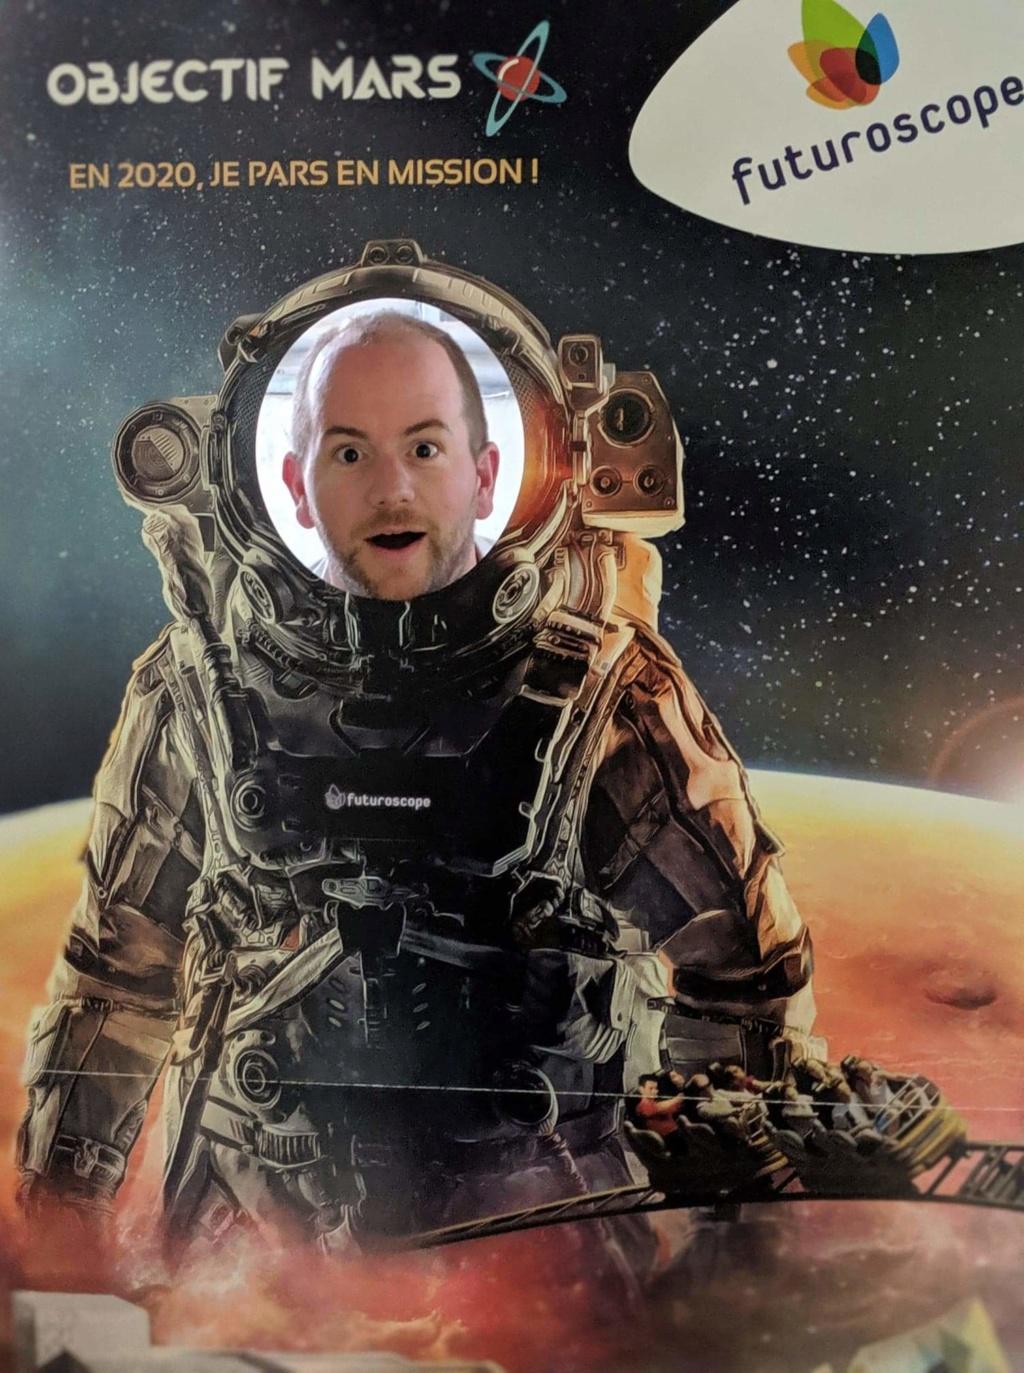 Objectif Mars (Projet Kepler : coaster au Futuroscope) · mars 2020 - Page 19 Receiv10